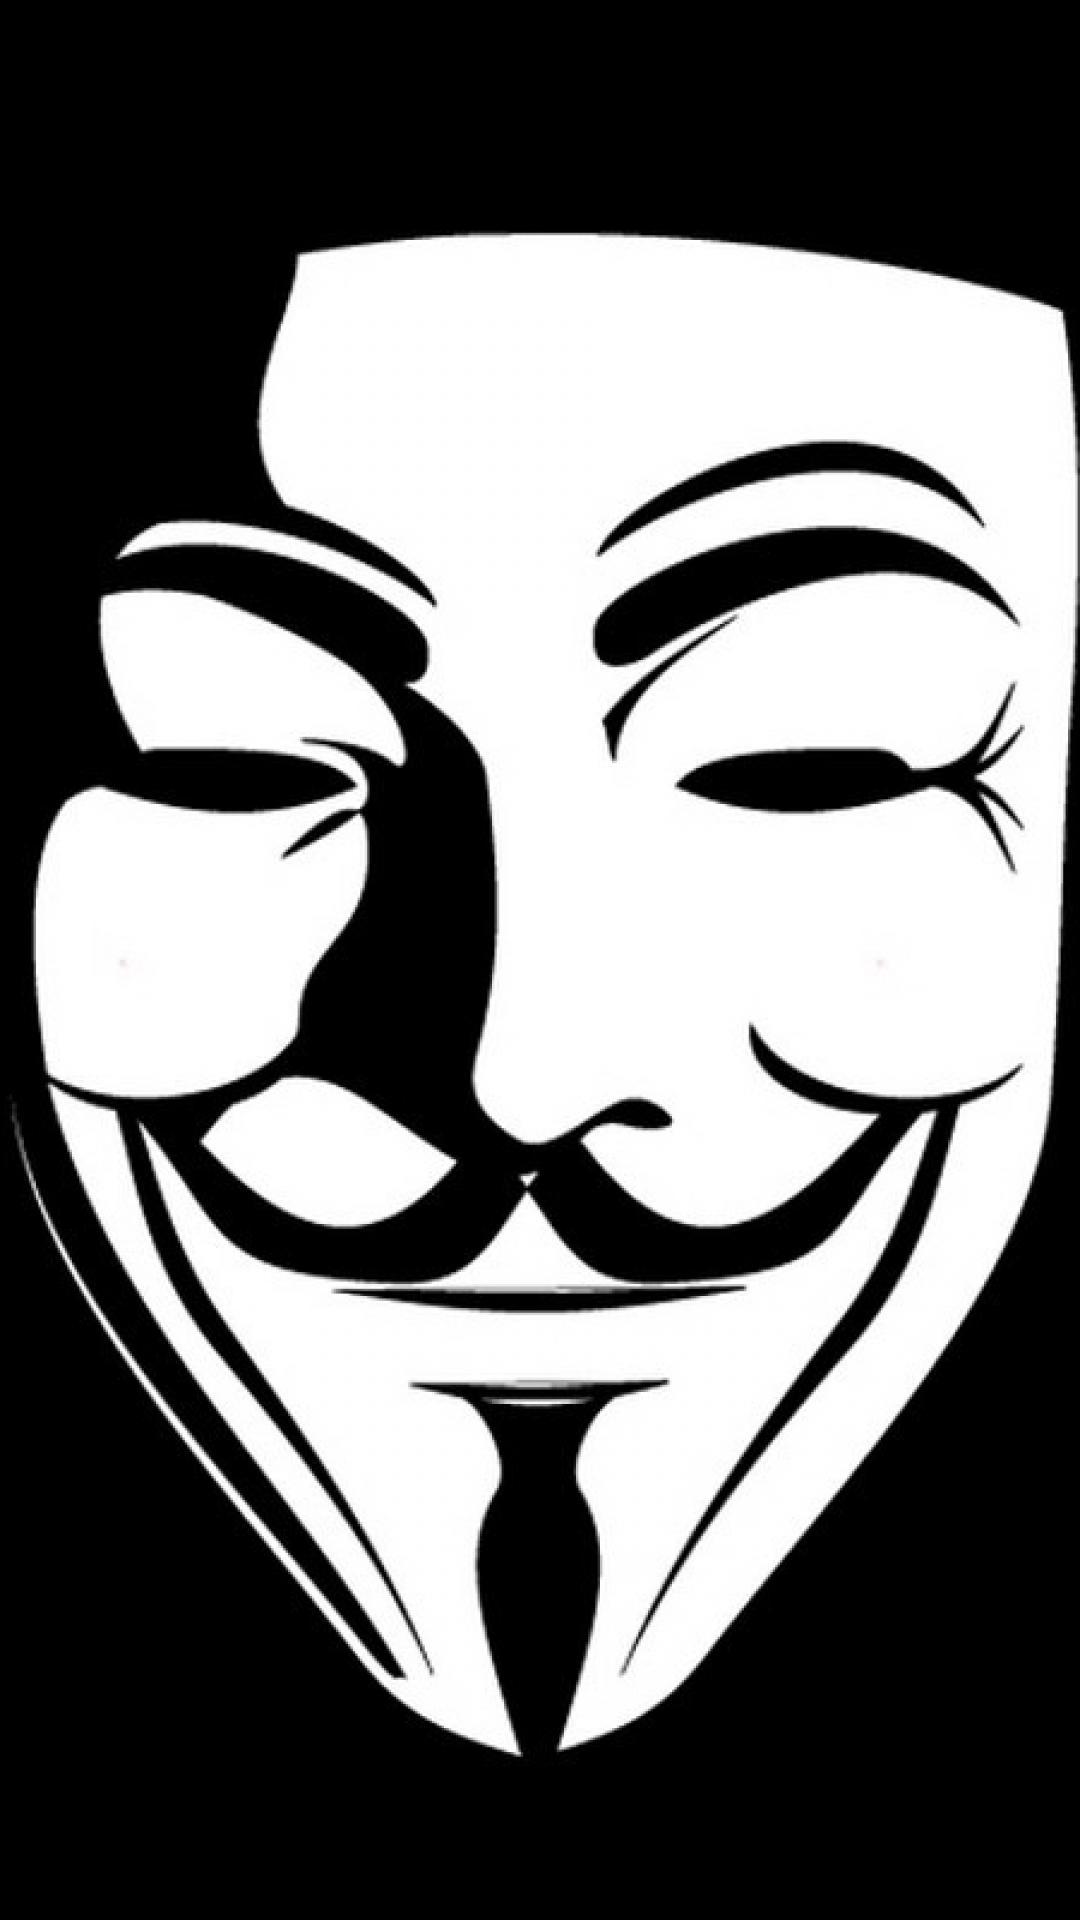 V For Vendetta Mask Vector At Getdrawings Free Download